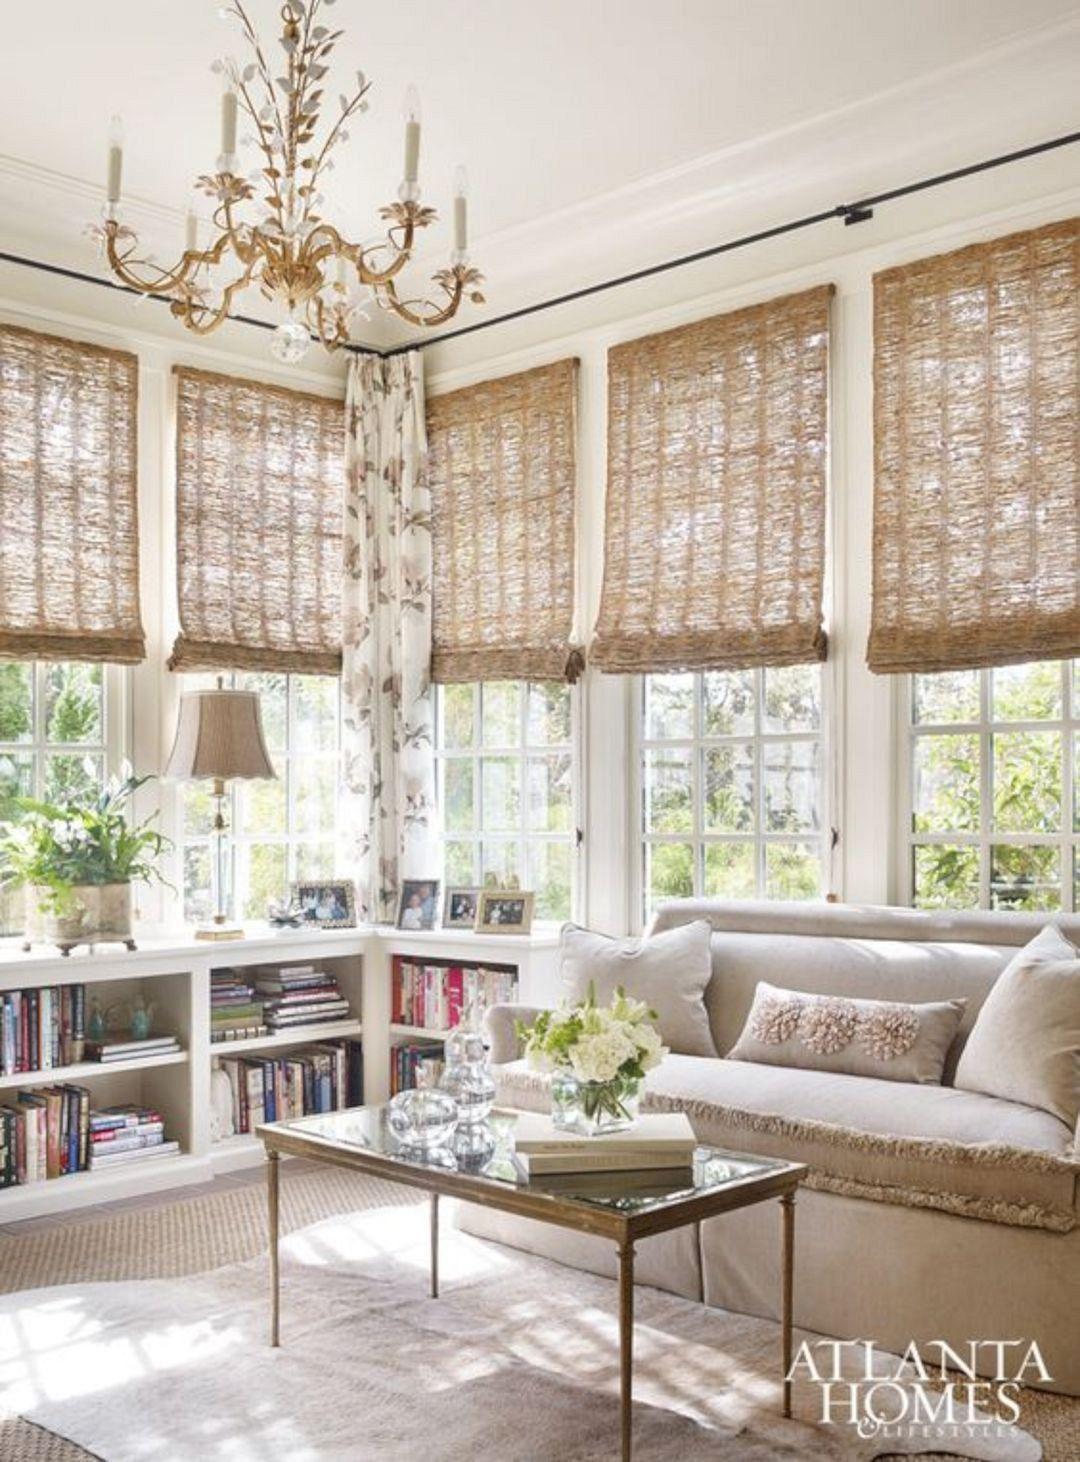 stylish interior design ideas for your summer house also rh pinterest